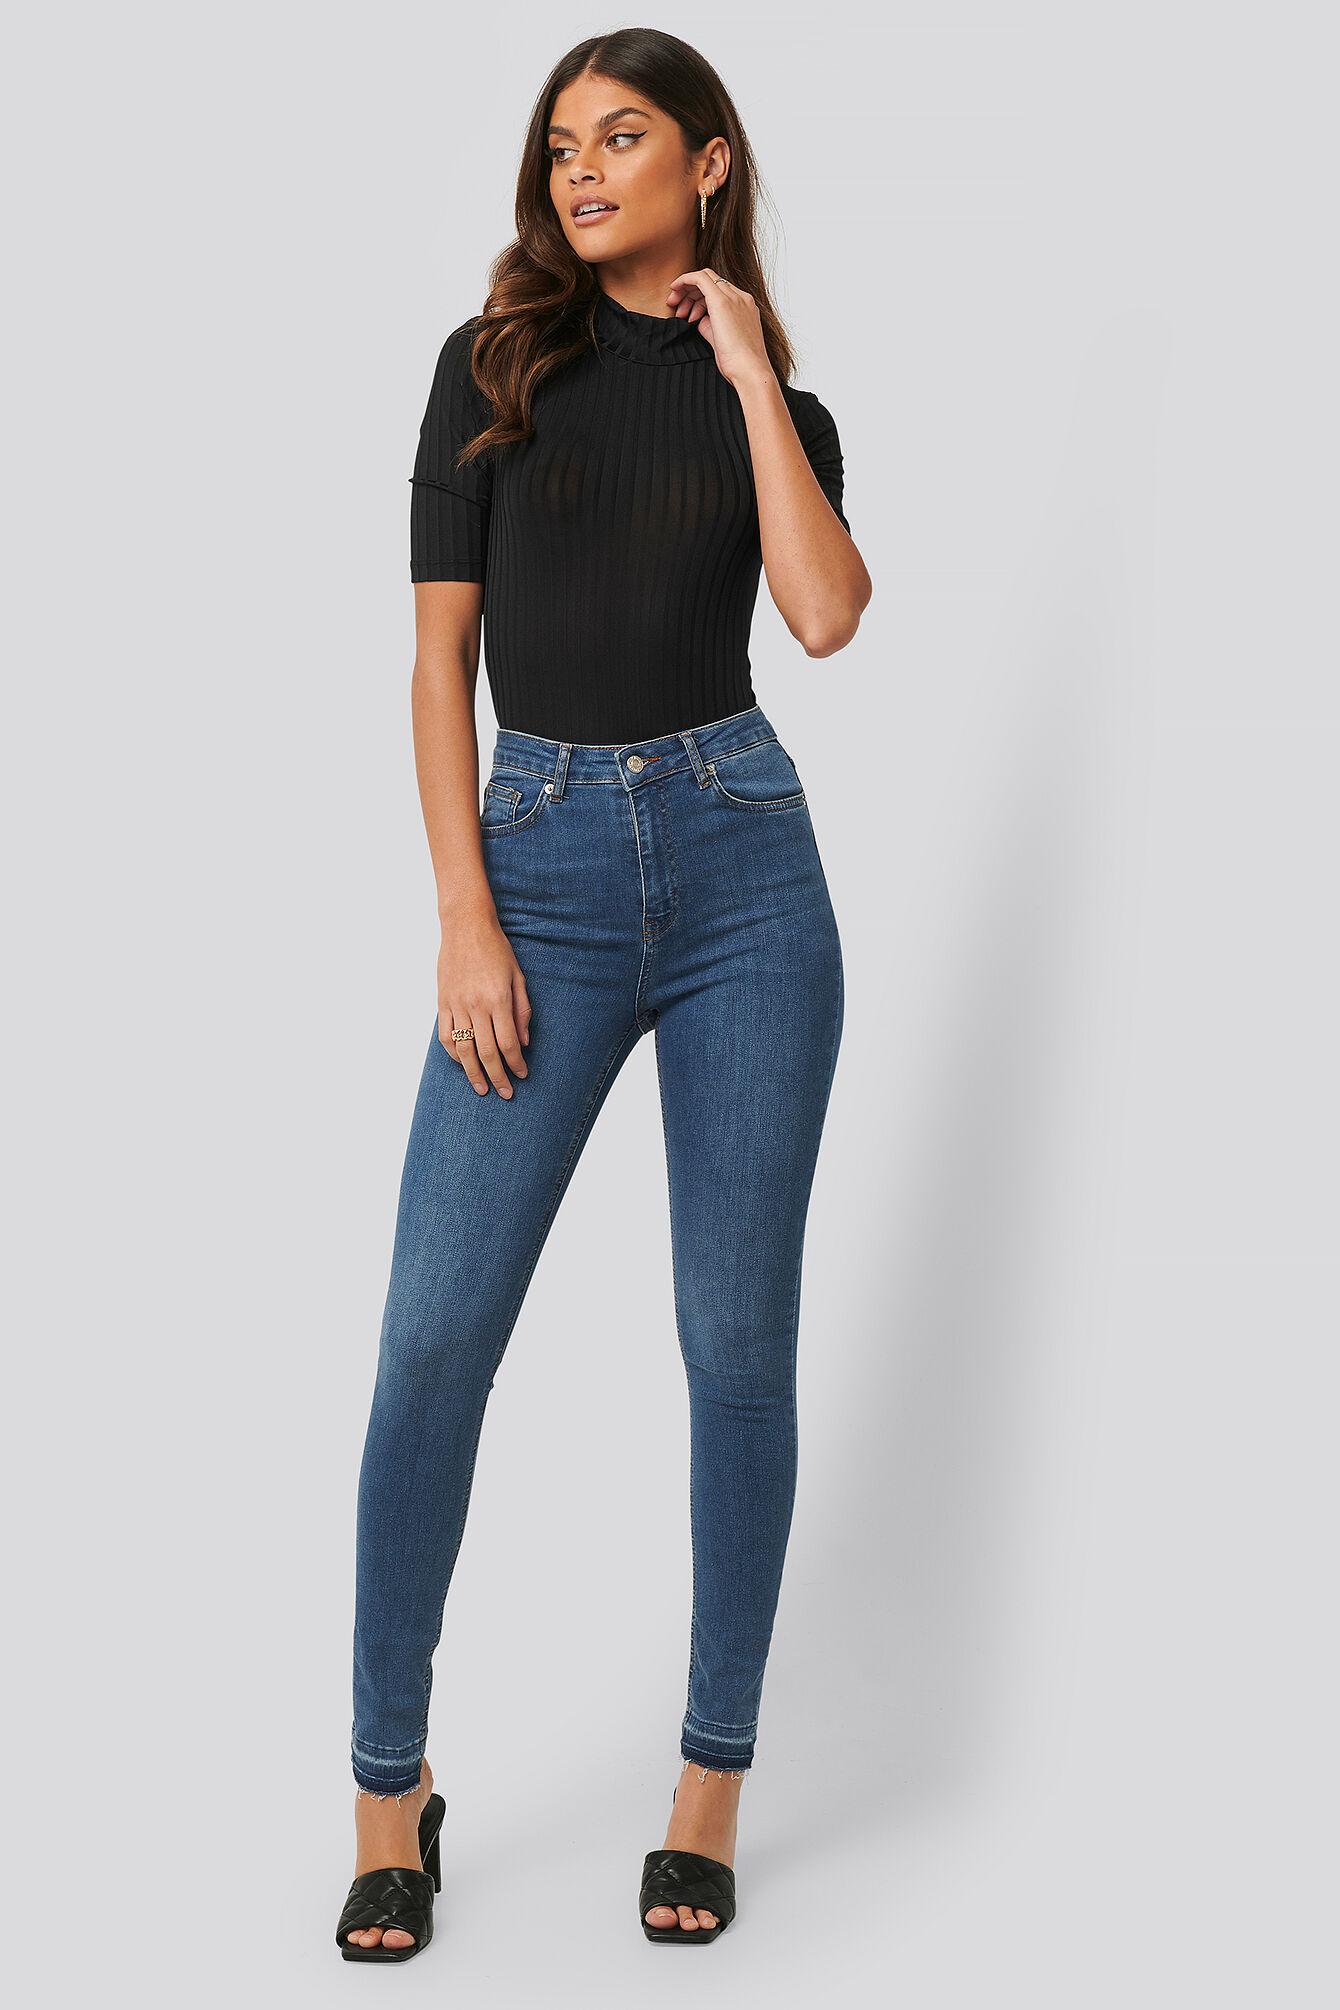 NA-KD Skinny High Waist Open Hem Jeans Tall - Blue  - Size: EU 32,EU 34,EU 36,EU 38,EU 40,EU 42